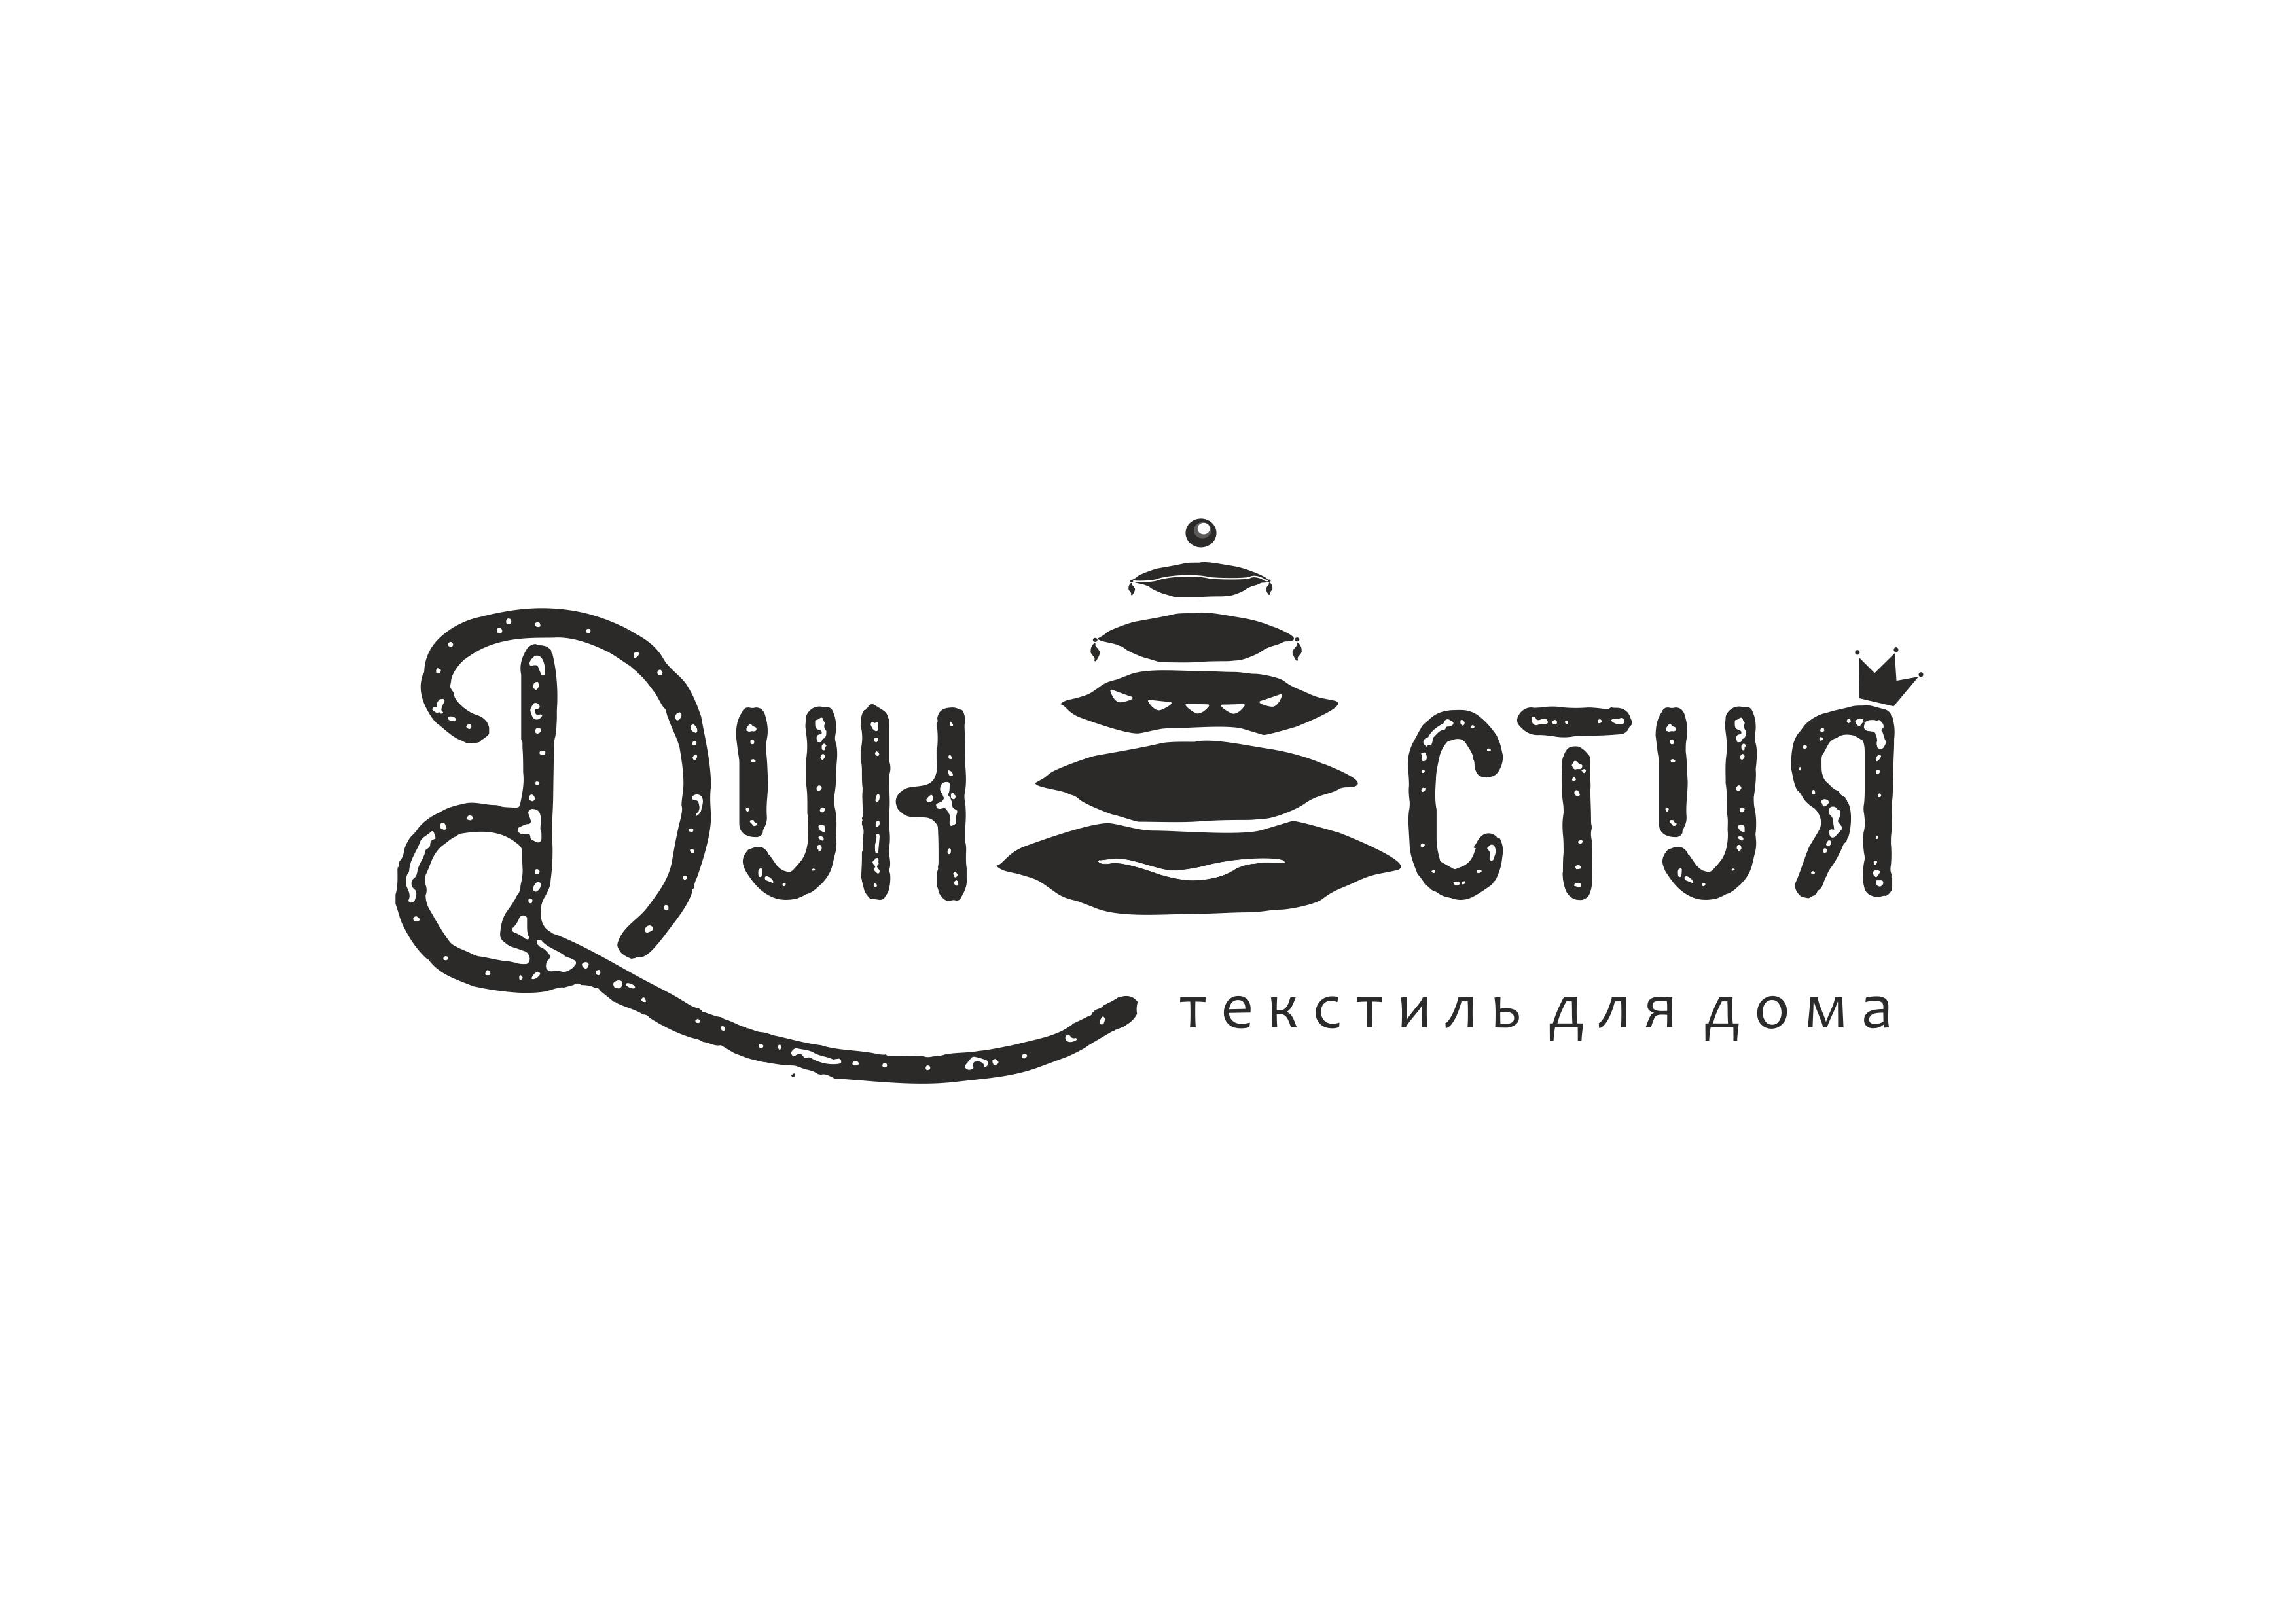 Разработать логотип для нового бренда фото f_96259e26c5b88845.jpg